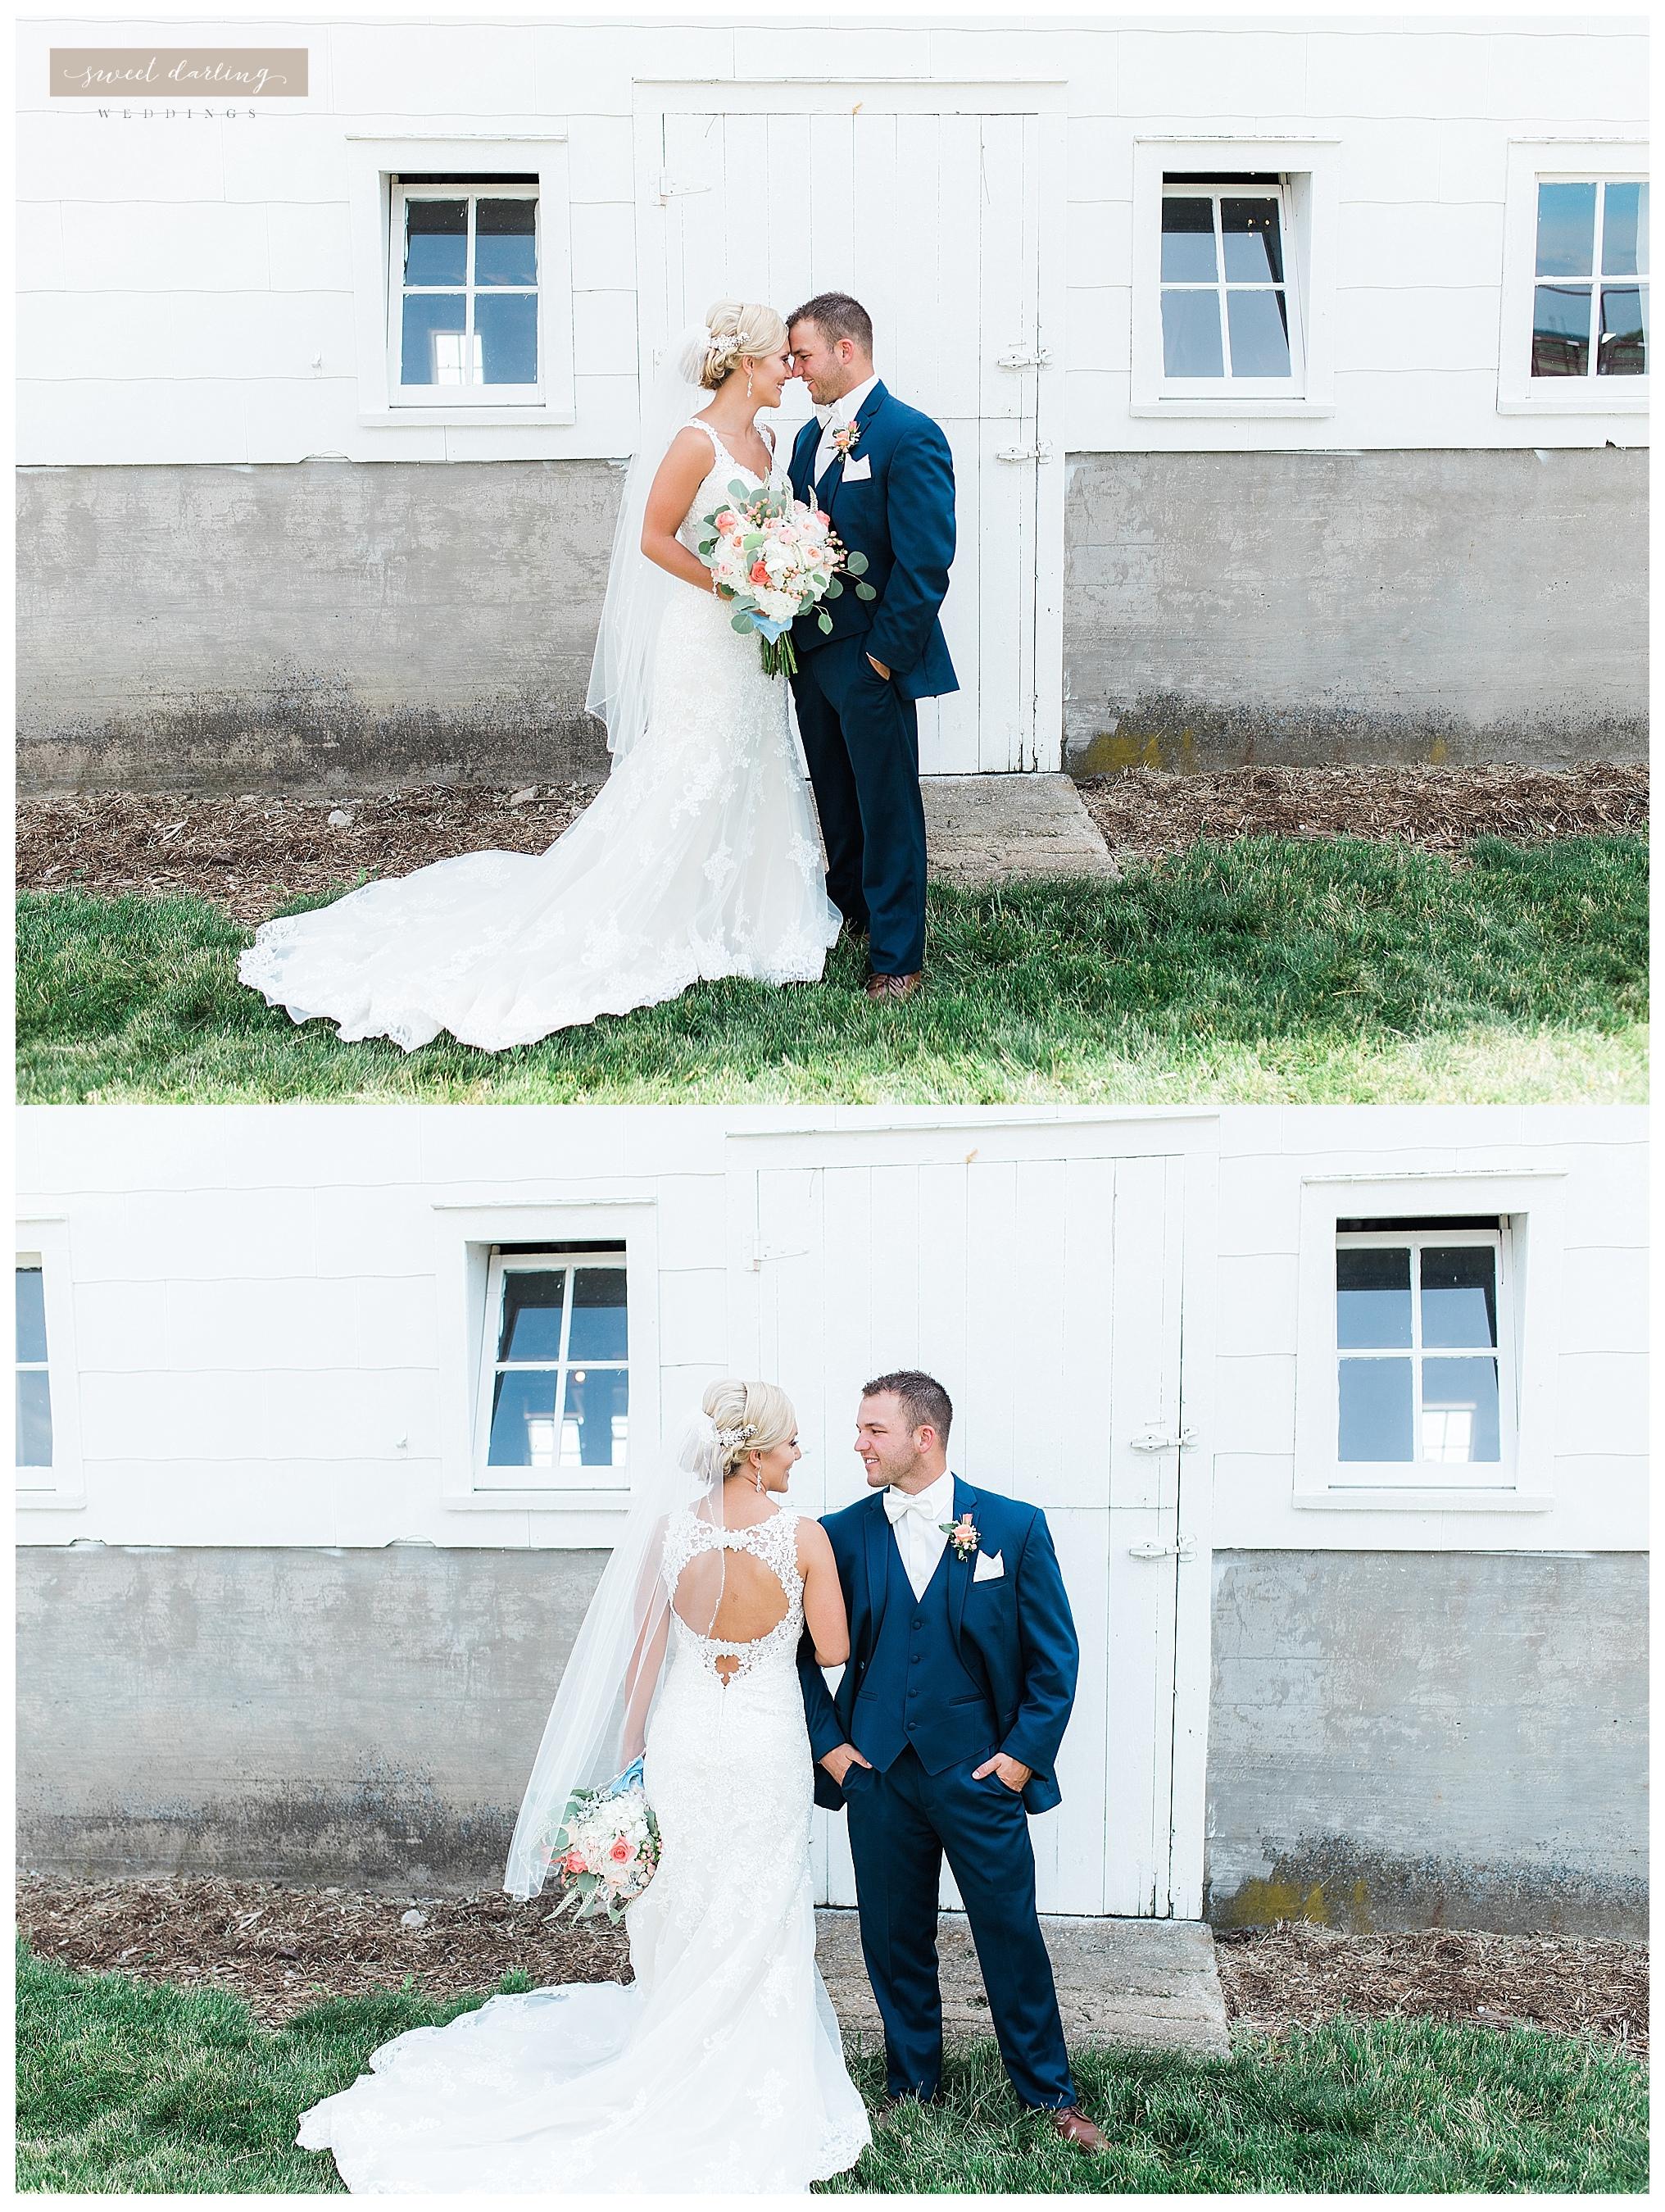 Paxton-illinois-engelbrecht-farmstead-romantic-wedding-photographer-sweet-darling-weddings_1243.jpg